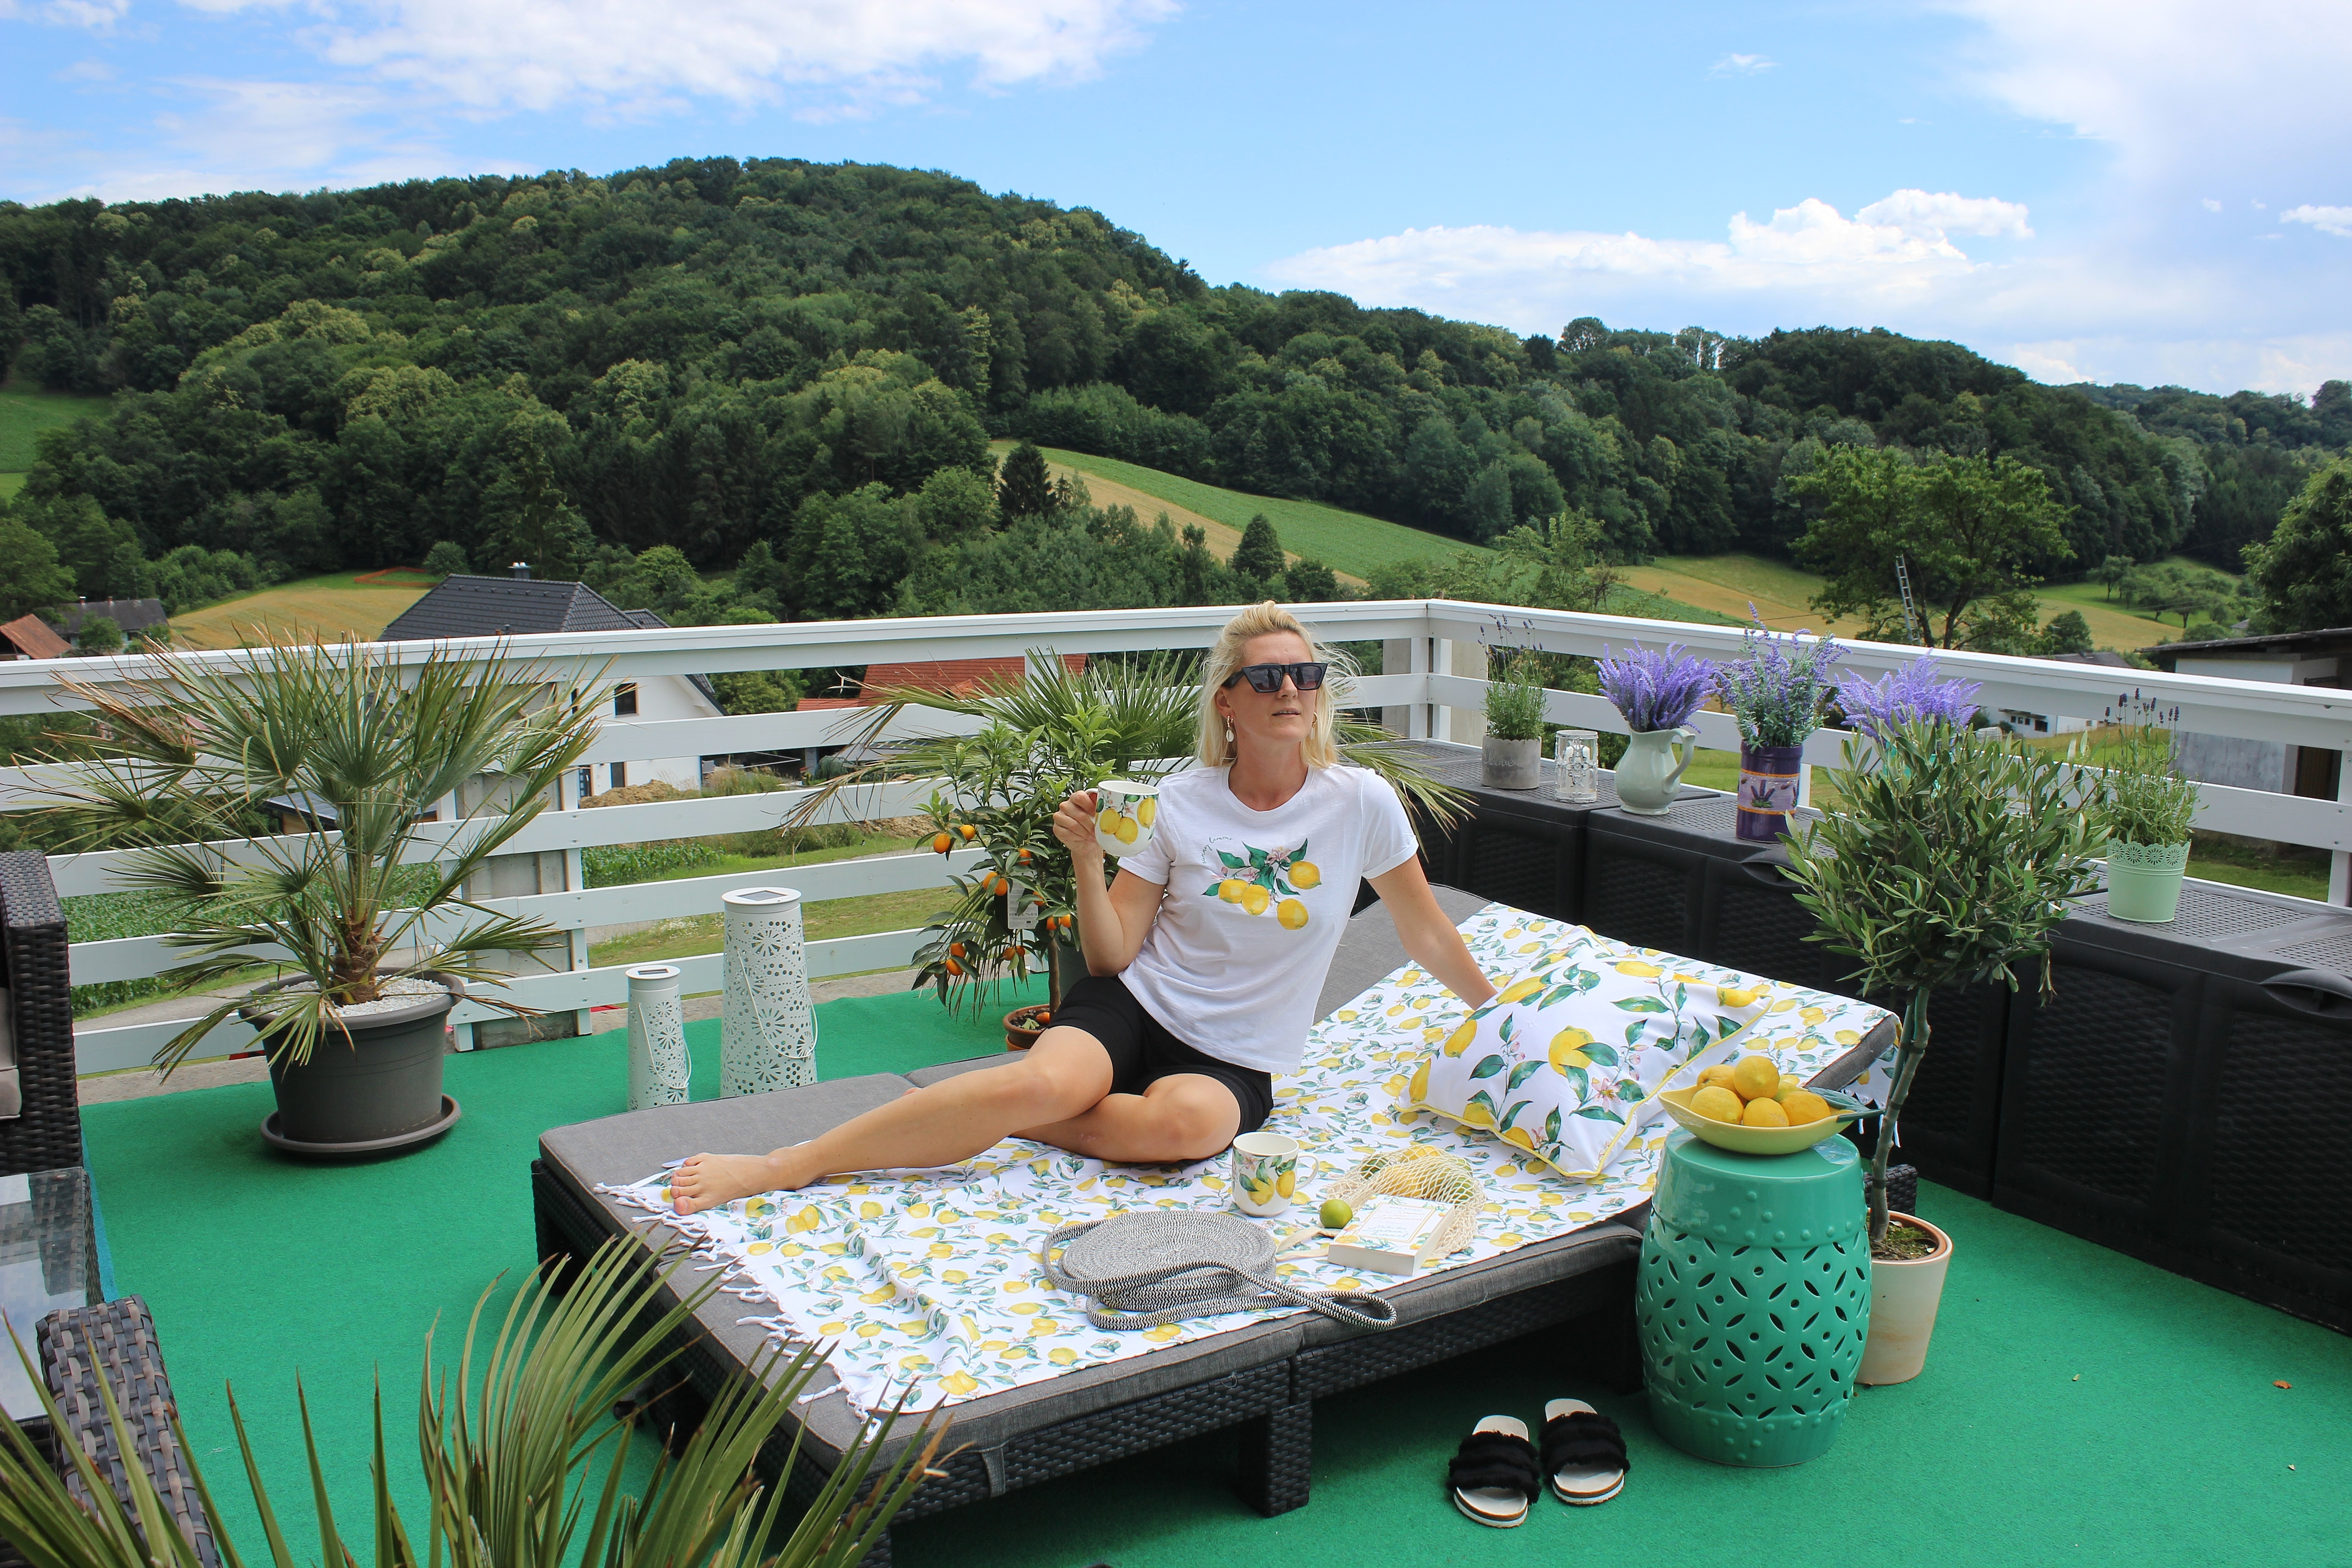 Tchibo-Eduscho-Capri Kollektion- Zitronen-Sommerlook-Sommeraccessoires-Sandalen-carrieslifestyle-Tamara Prutsch